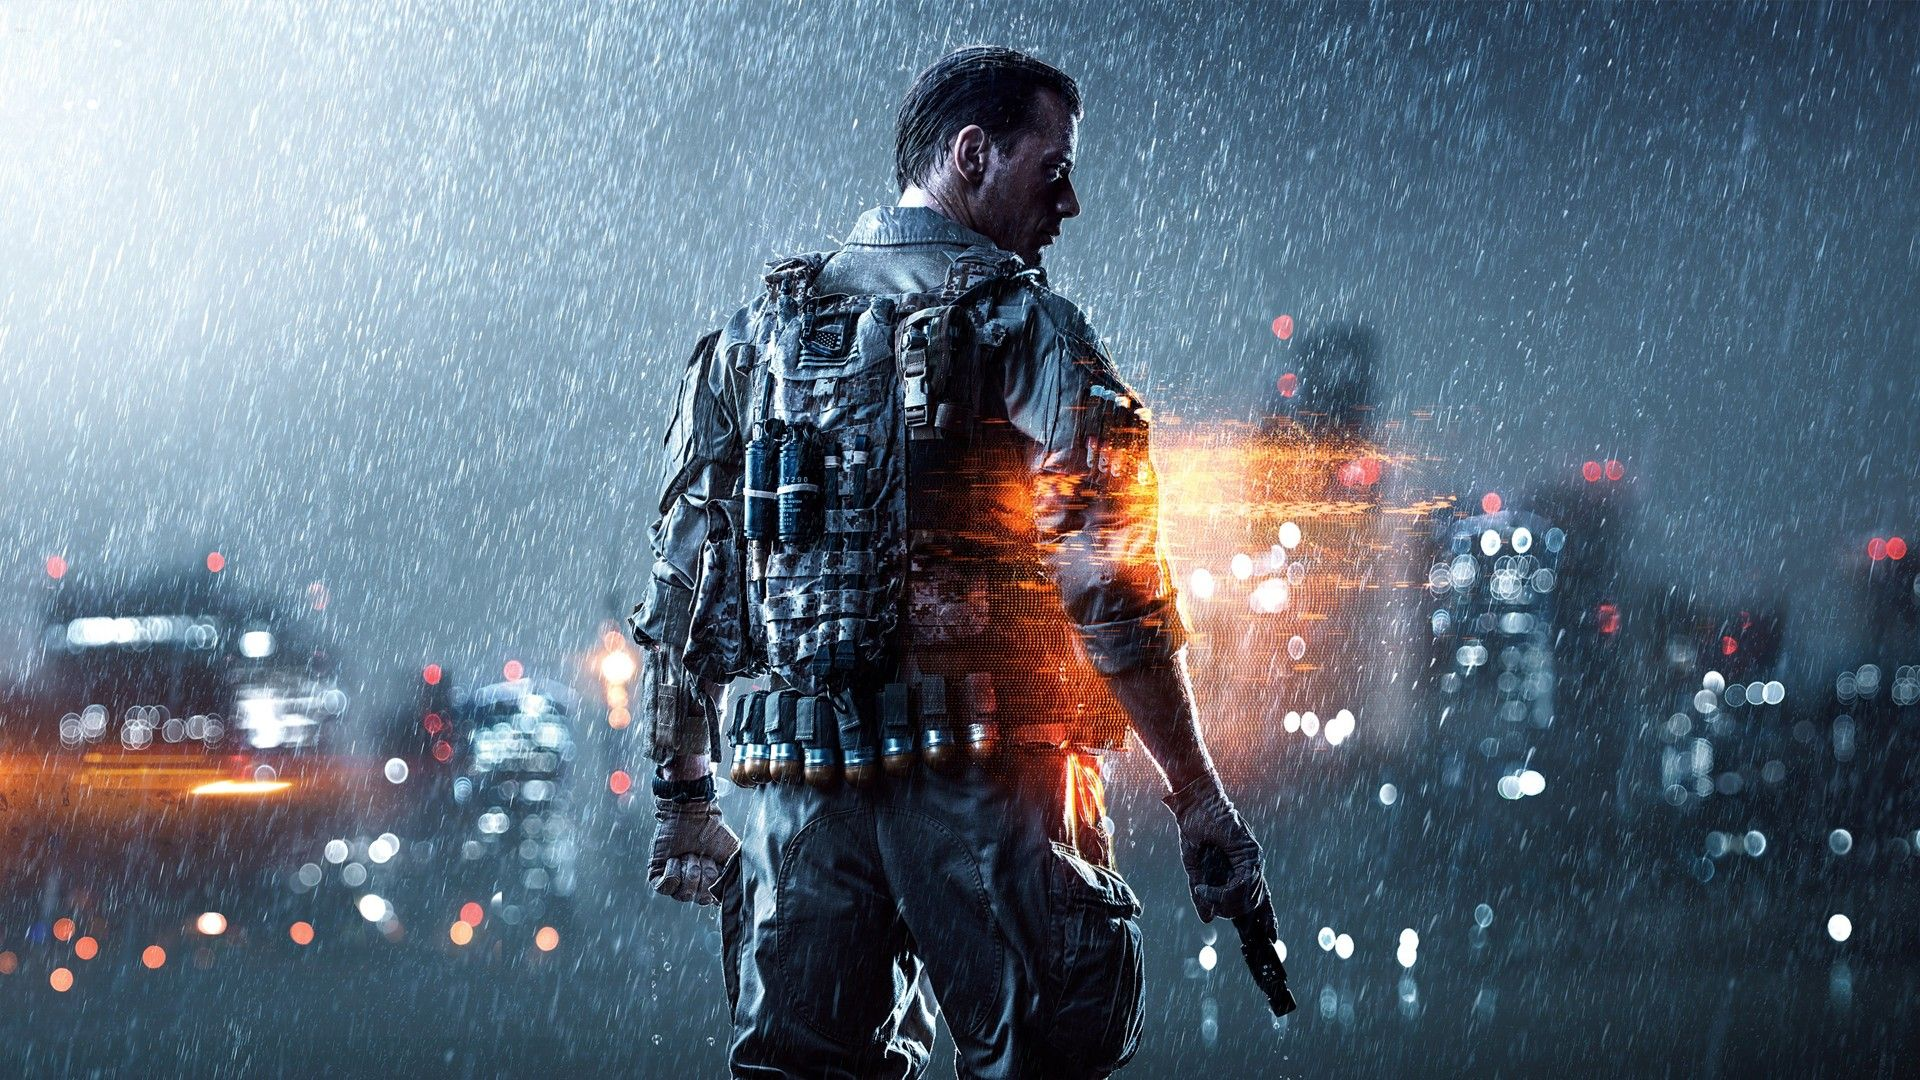 Battlefield 4 Hd Wallpapers Jeux Gratuit Sport Extreme Fond